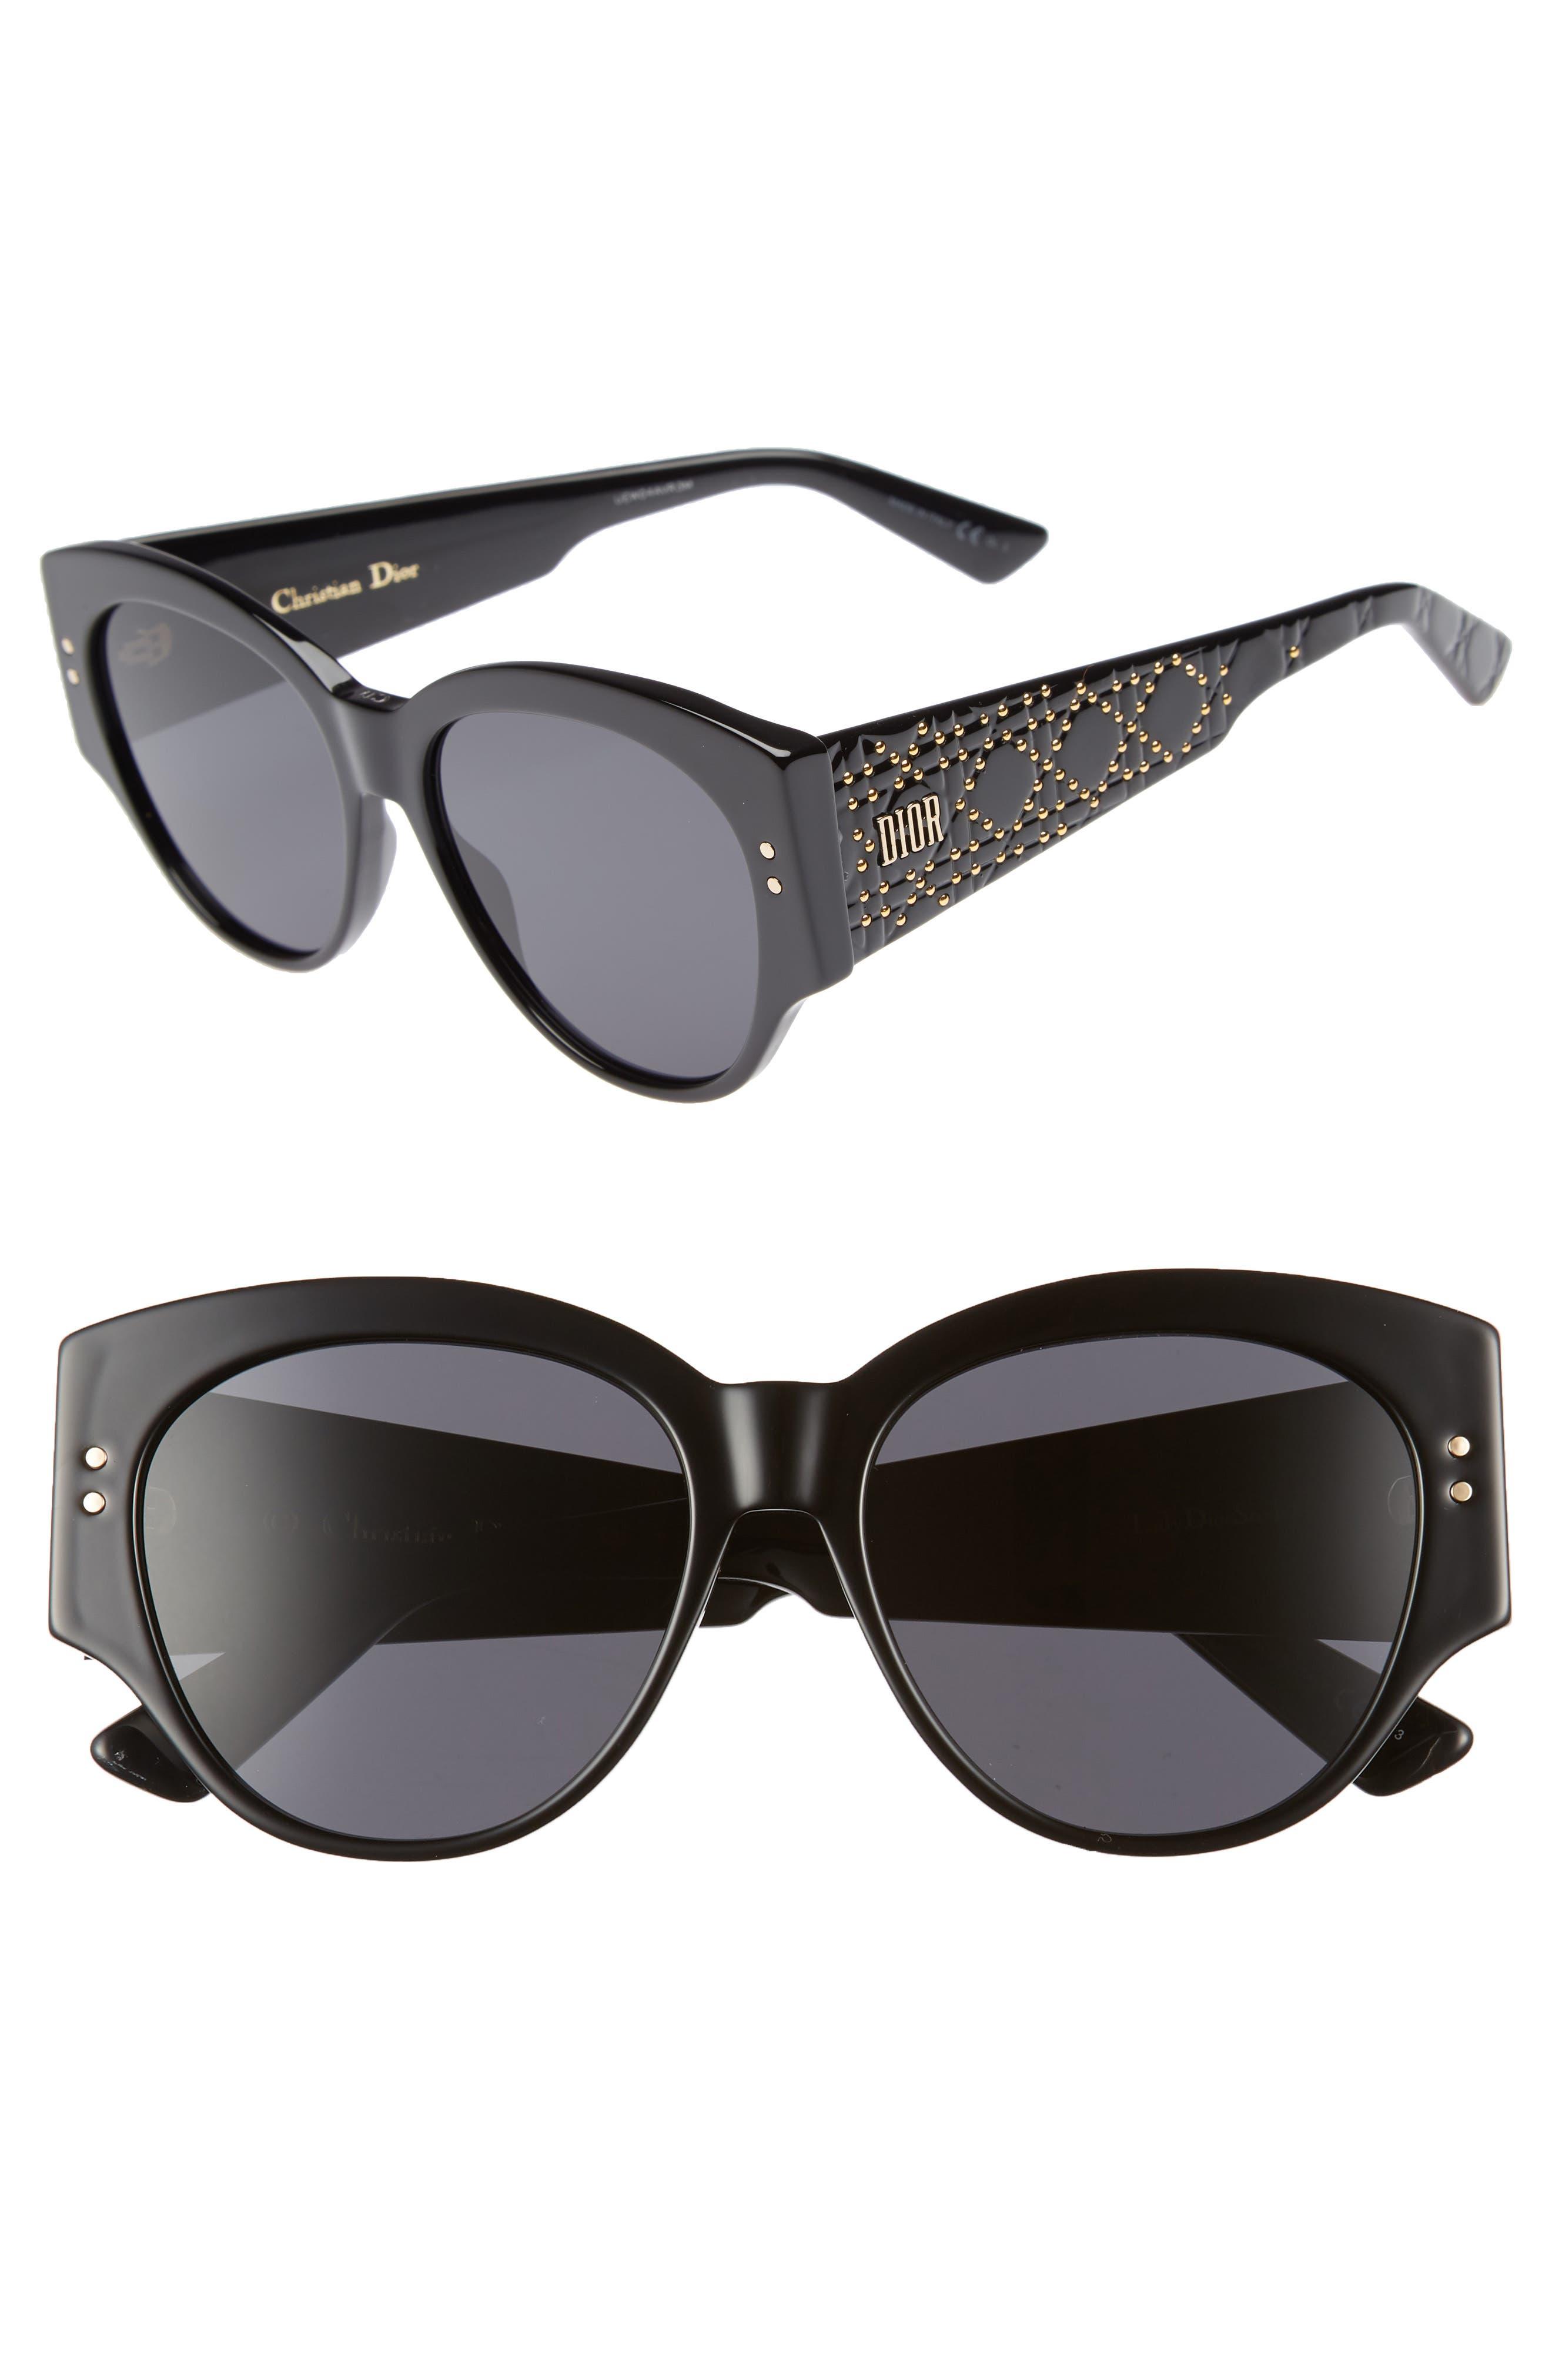 speckled frame sunglasses - Pink & Purple Dior XMAL1